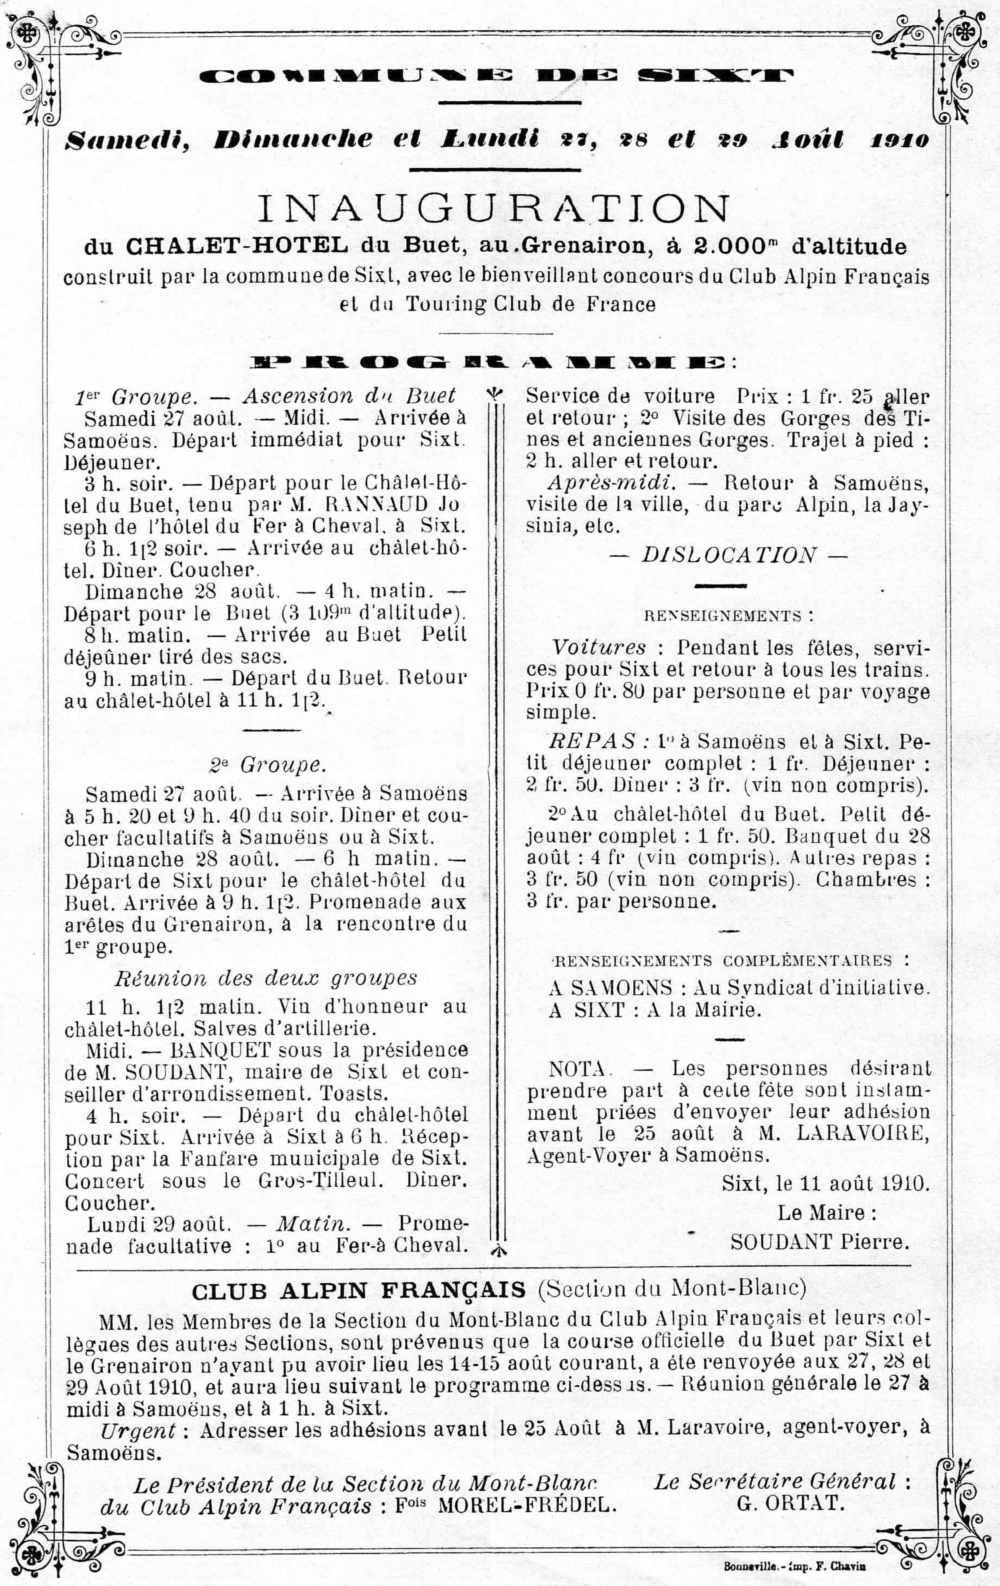 Affiche d'inauguration du refuge du grenairon